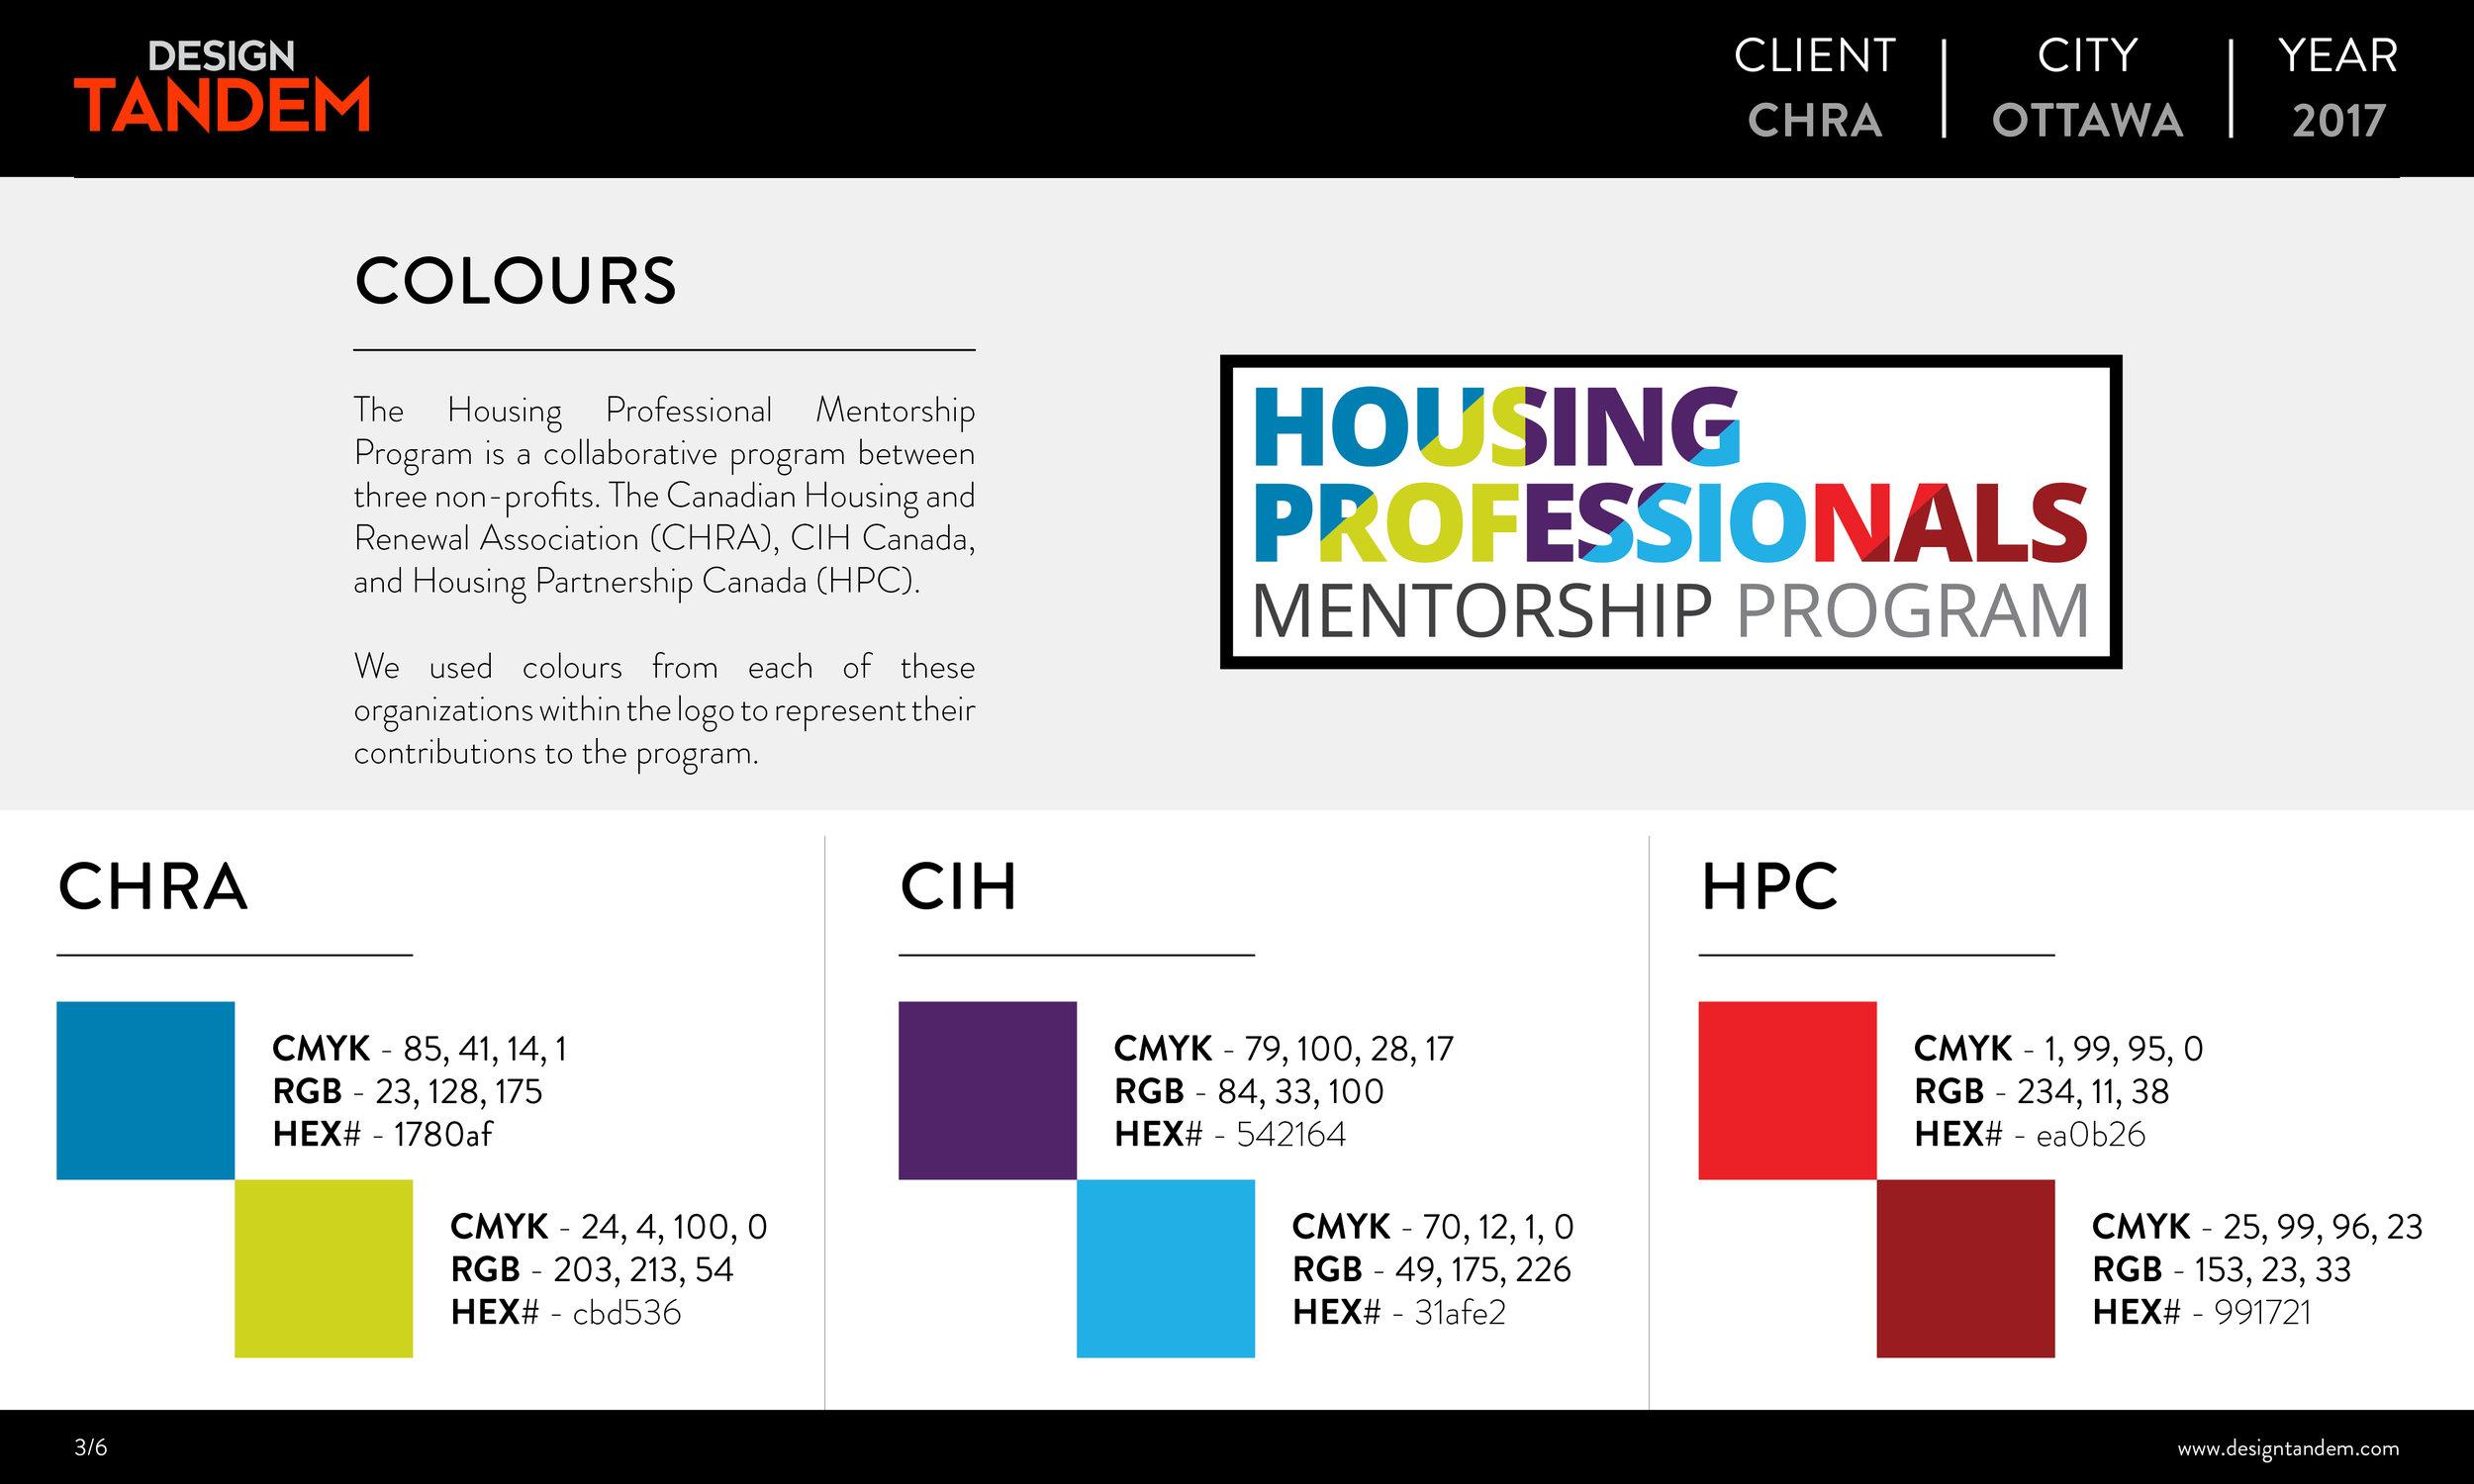 Housing-Professionals-Mentorship-Program-Branding3.jpg